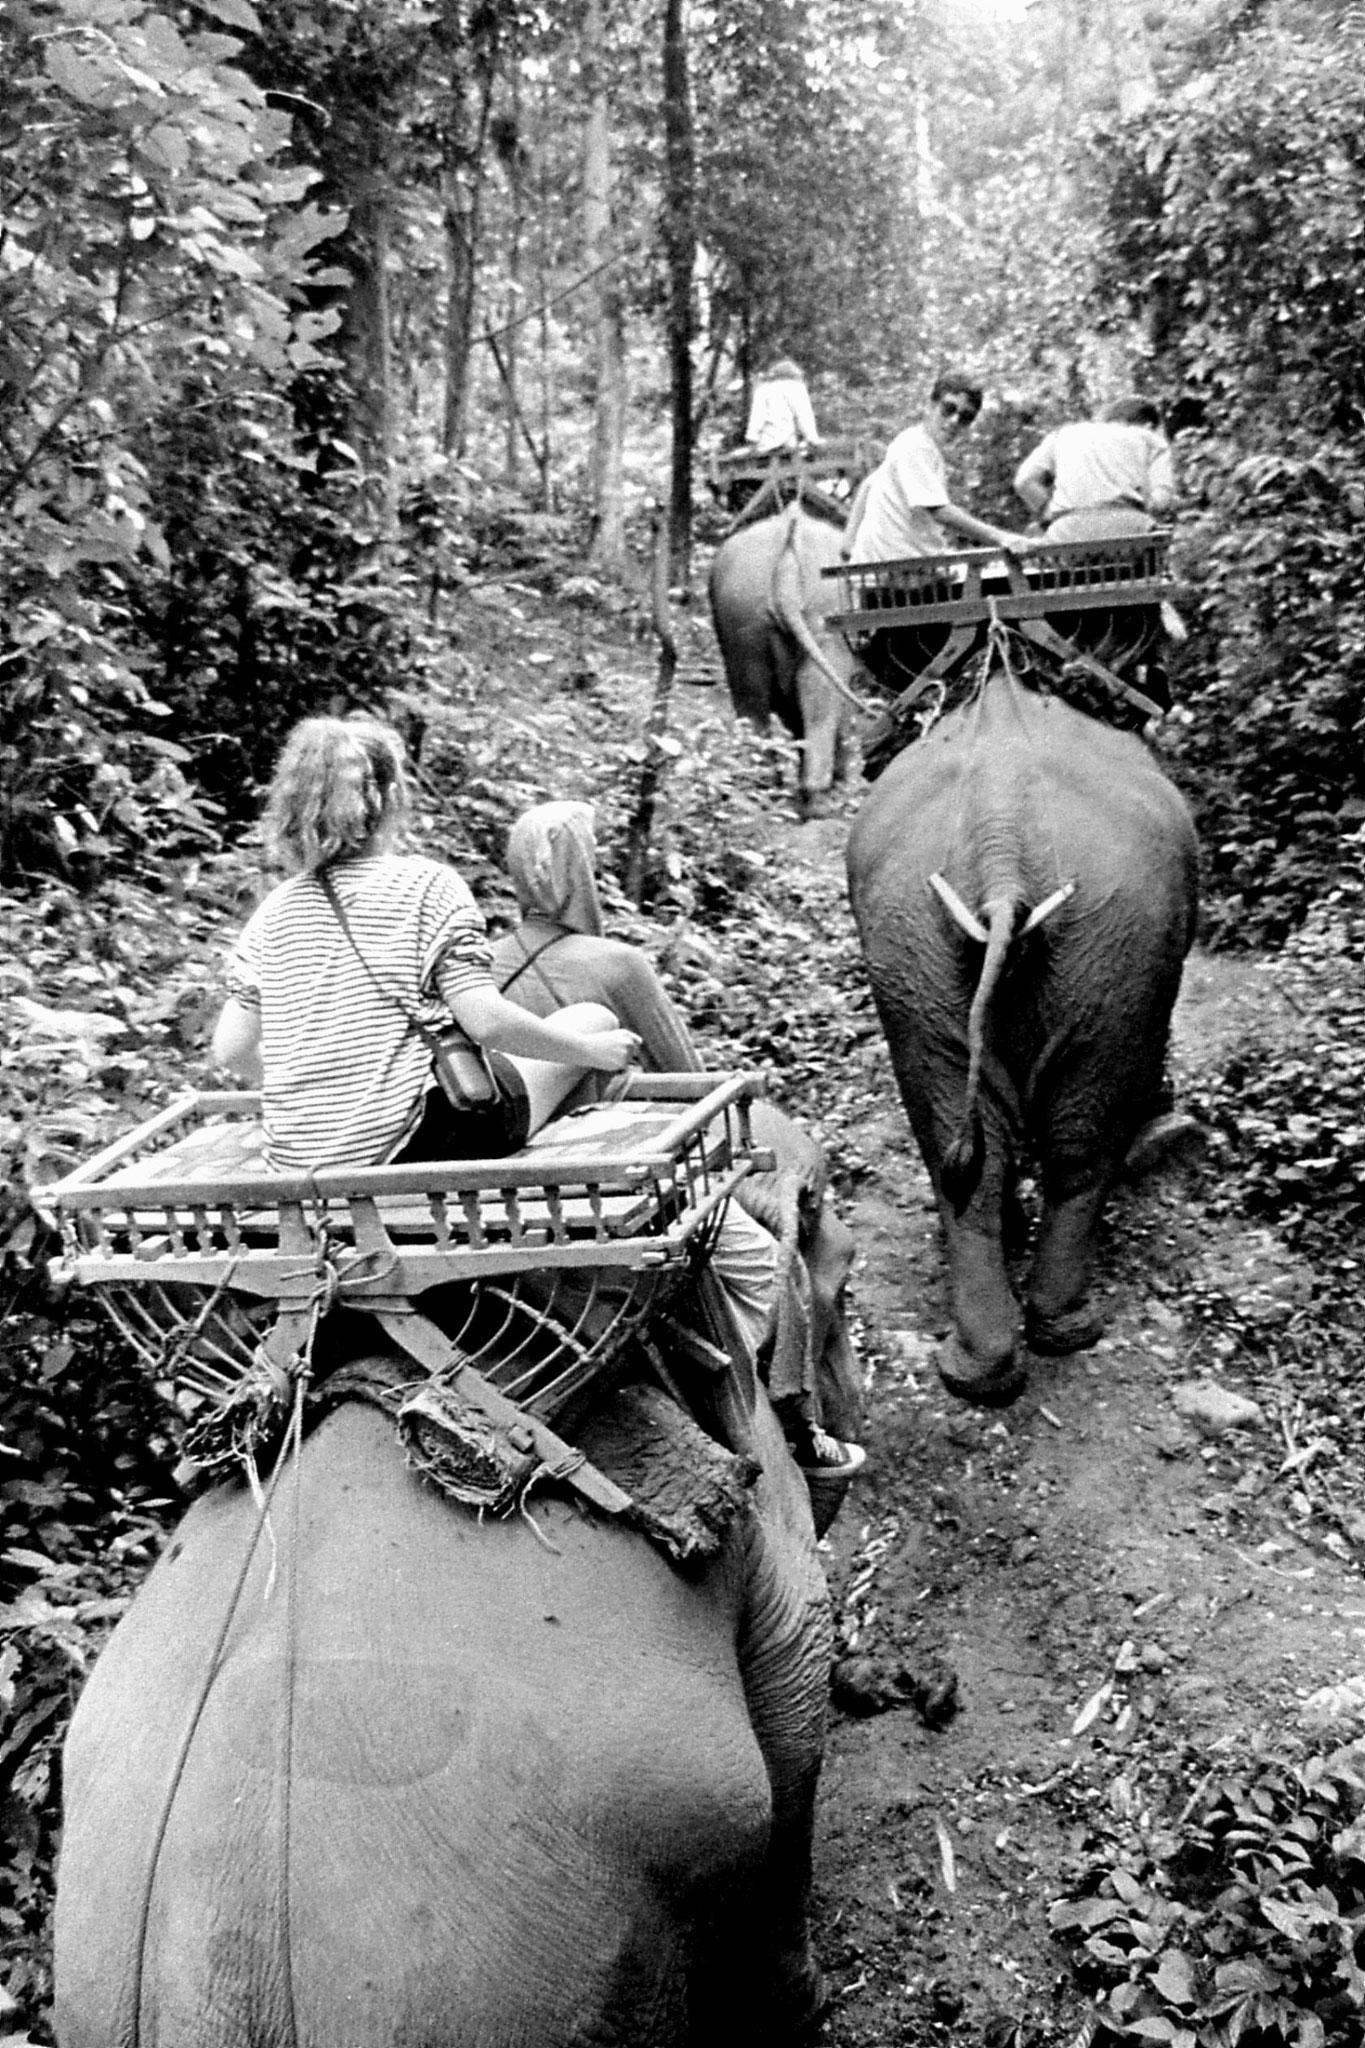 13/6/1990: 24: Last day of Trek, on elephant